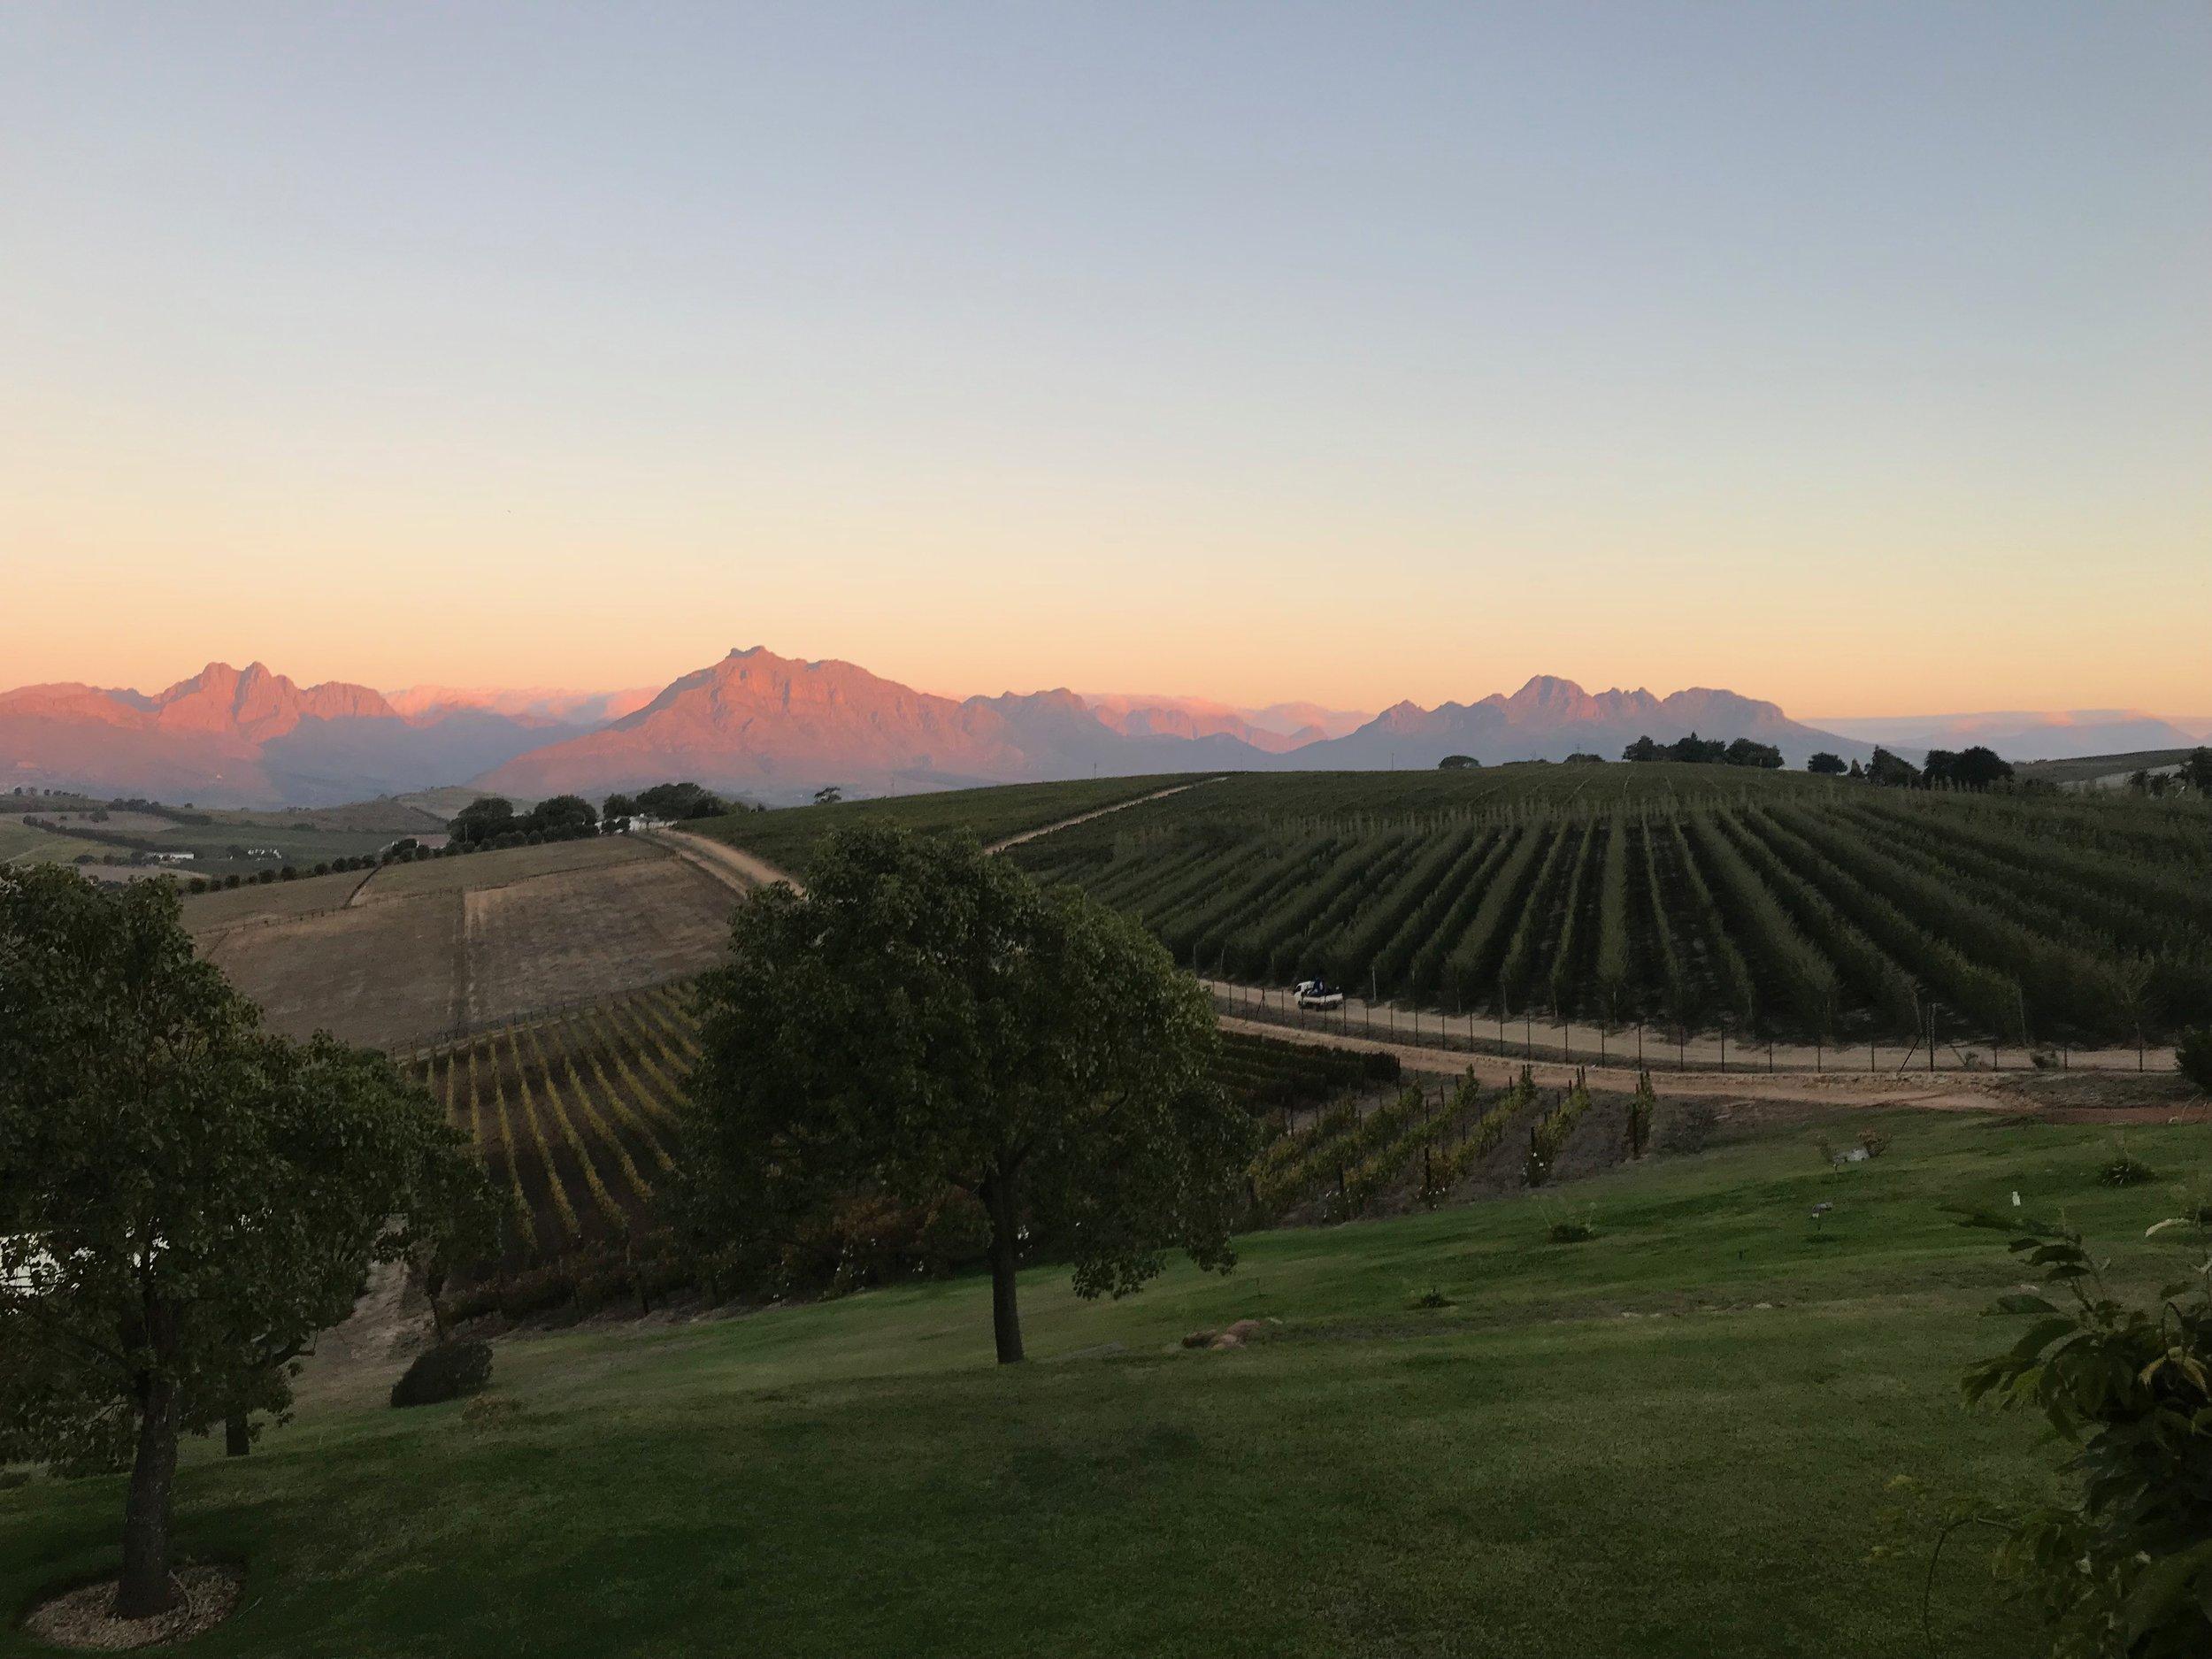 A glimpse of the stunning winelands in Stellenbosch.